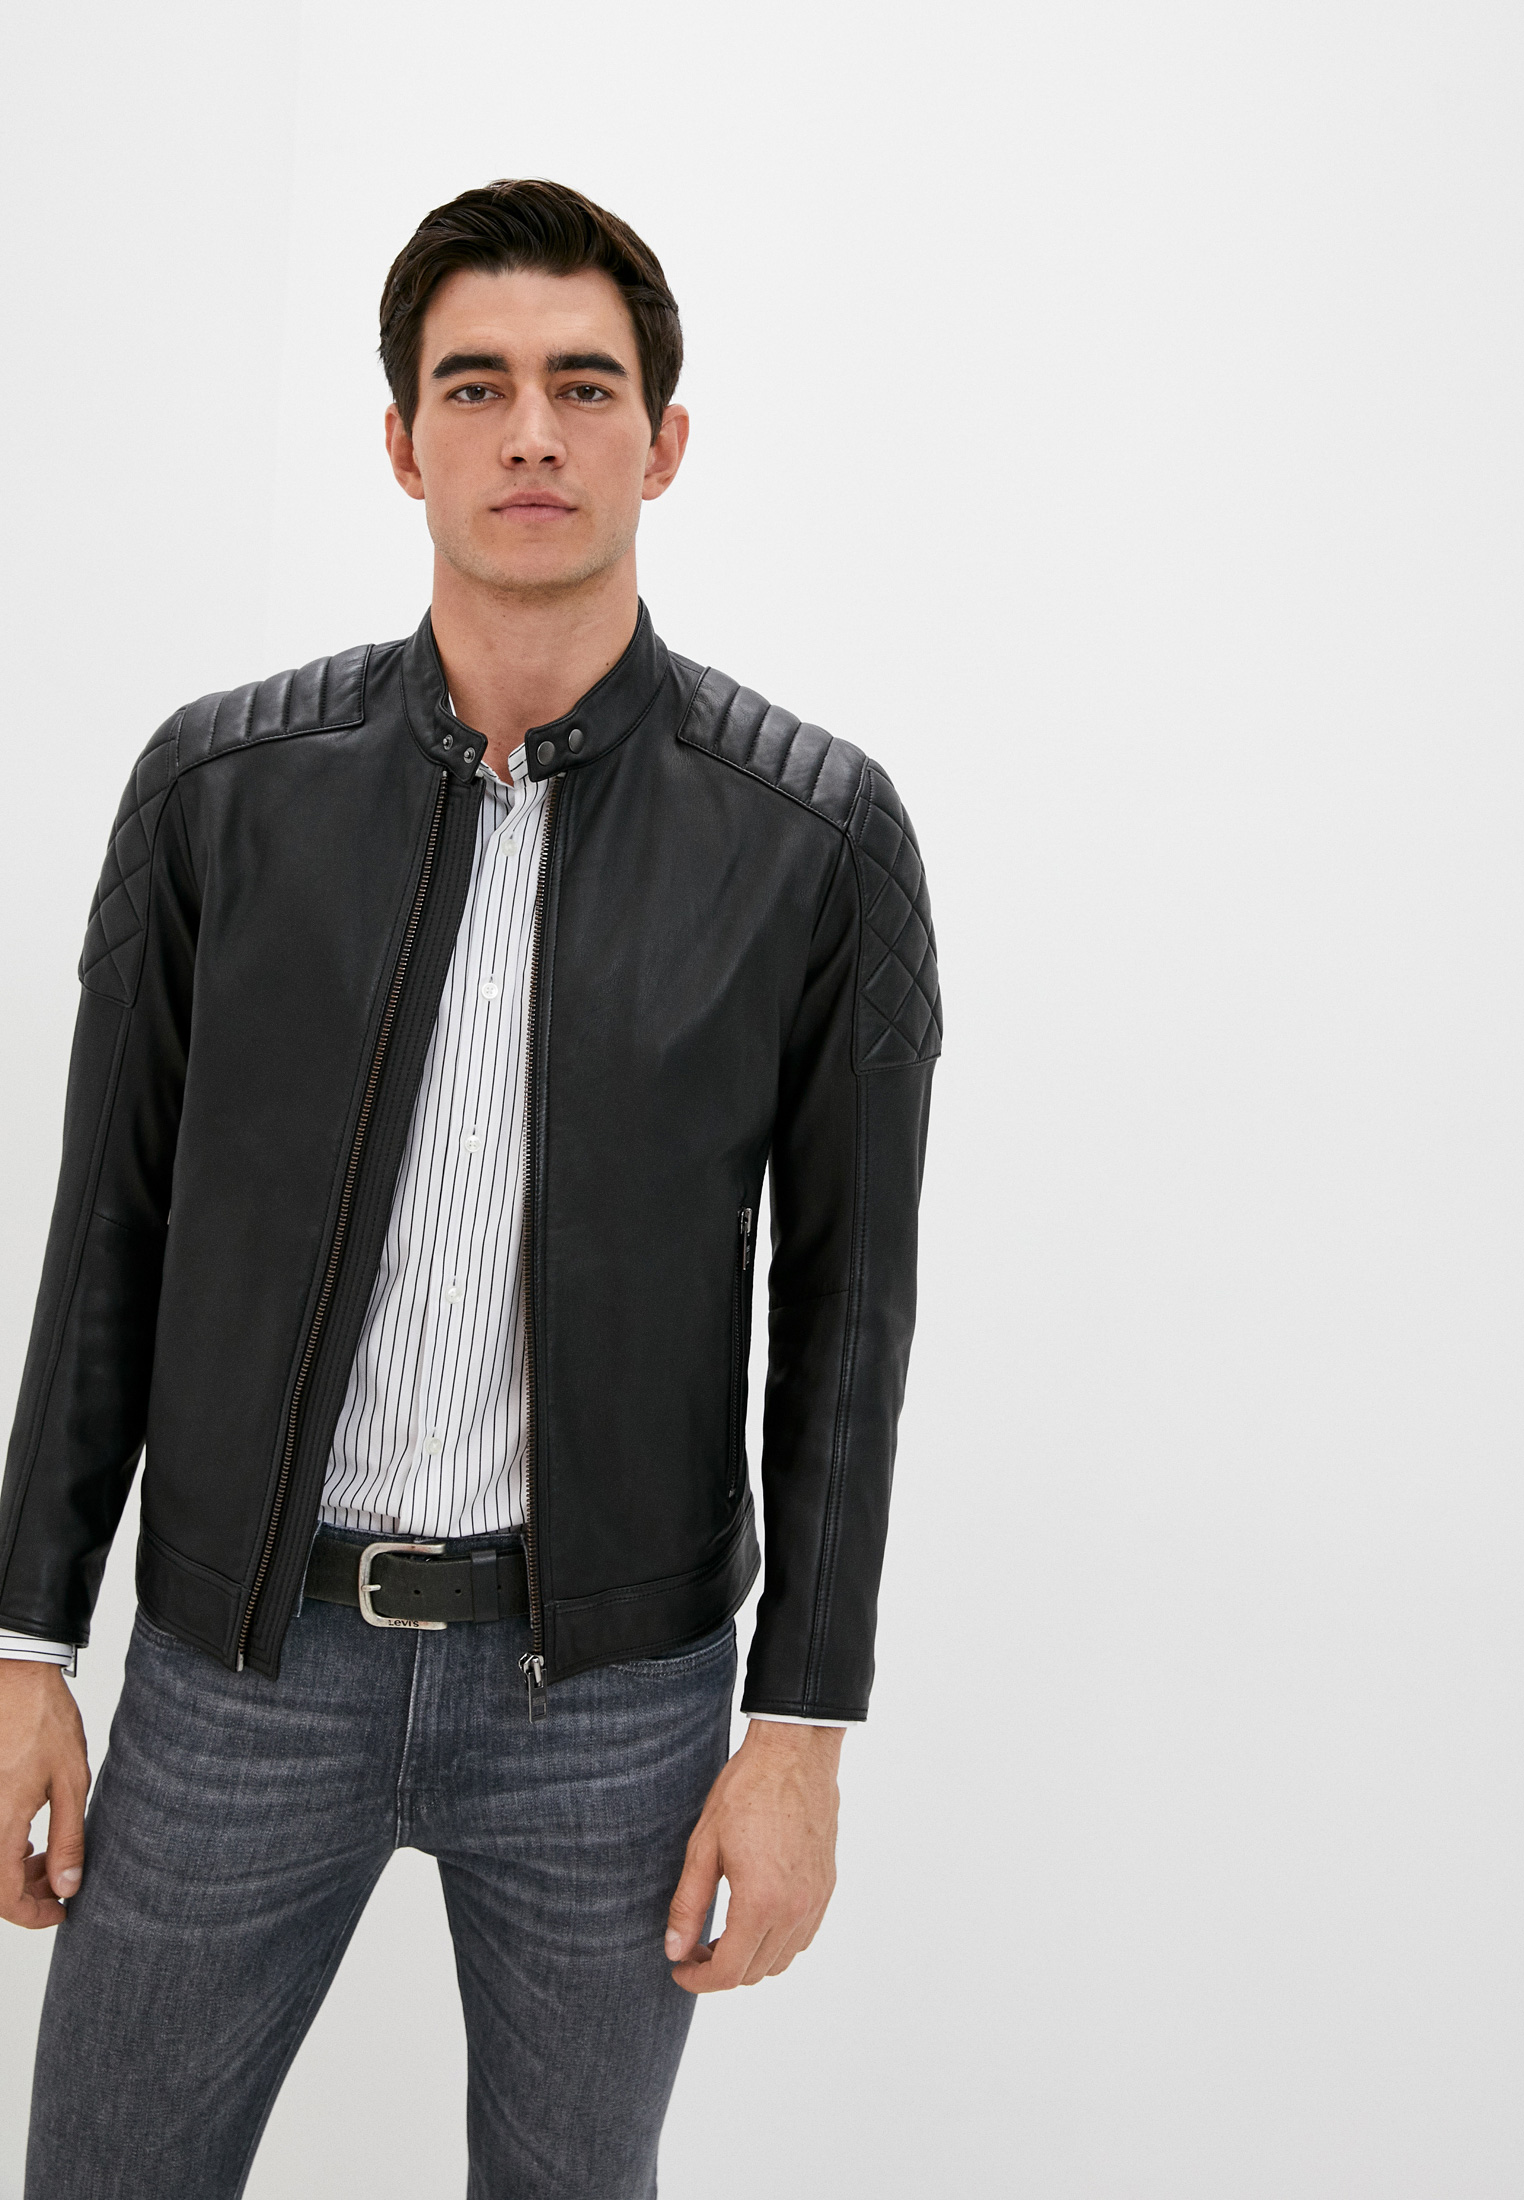 Куртка кожаная Boss Jeean 1 за 54 000 ₽. в интернет-магазине Lamoda.ru